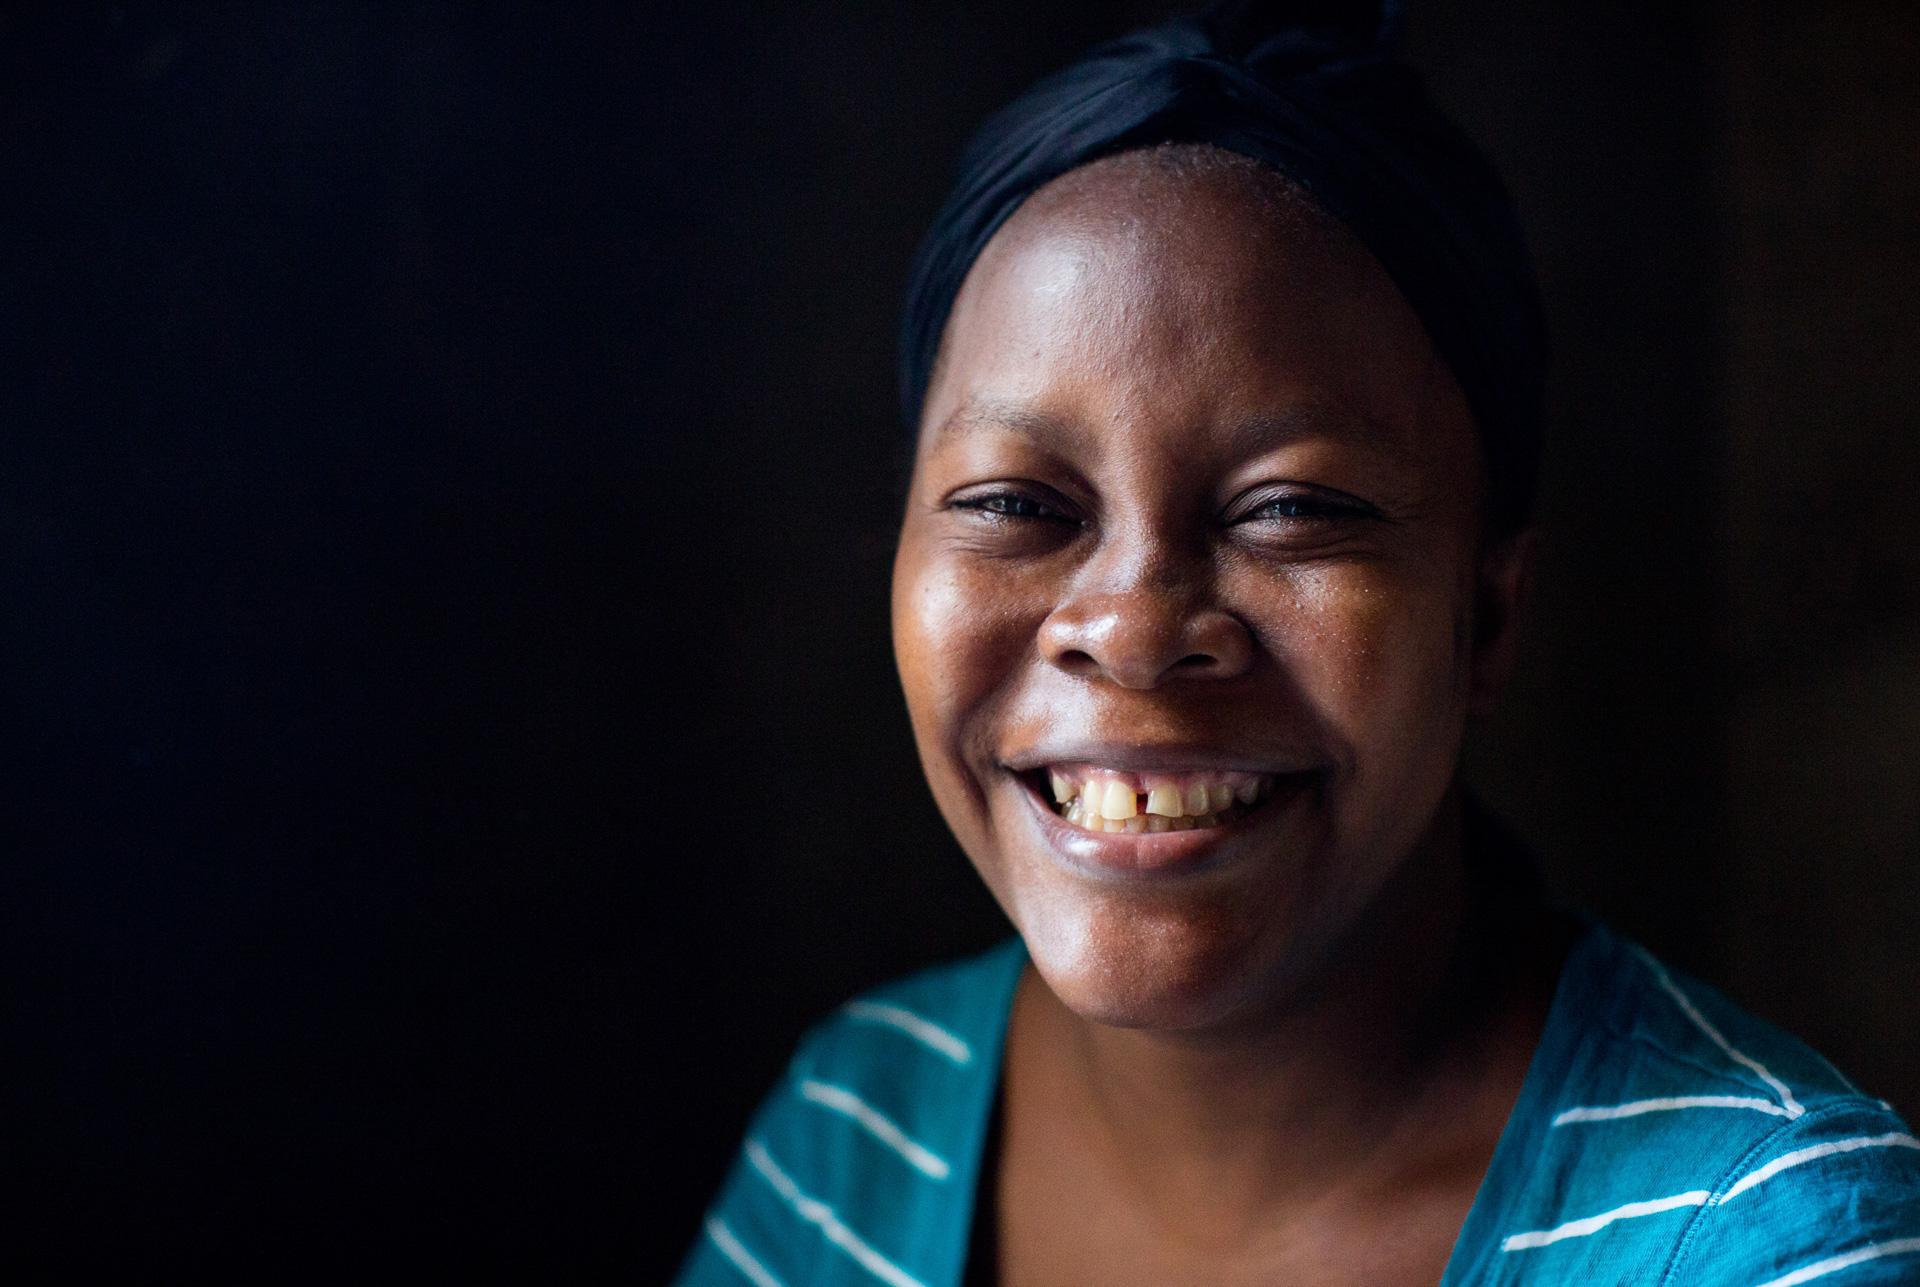 Headshot of woman smiling.